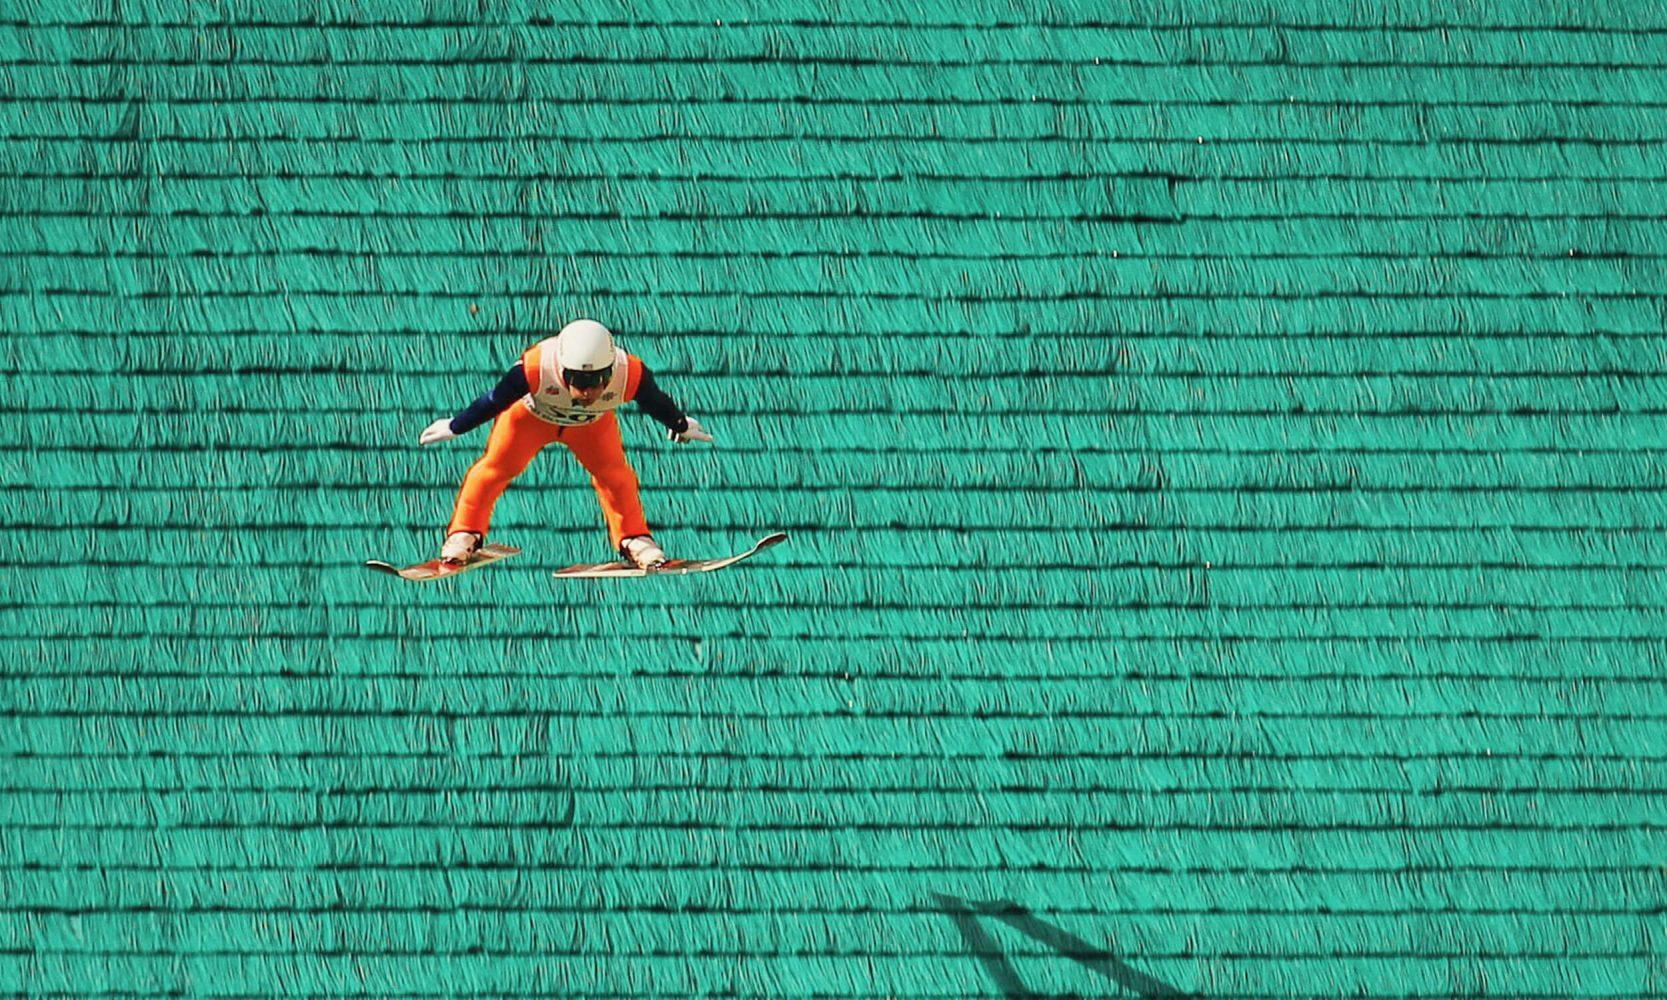 man on skis in air